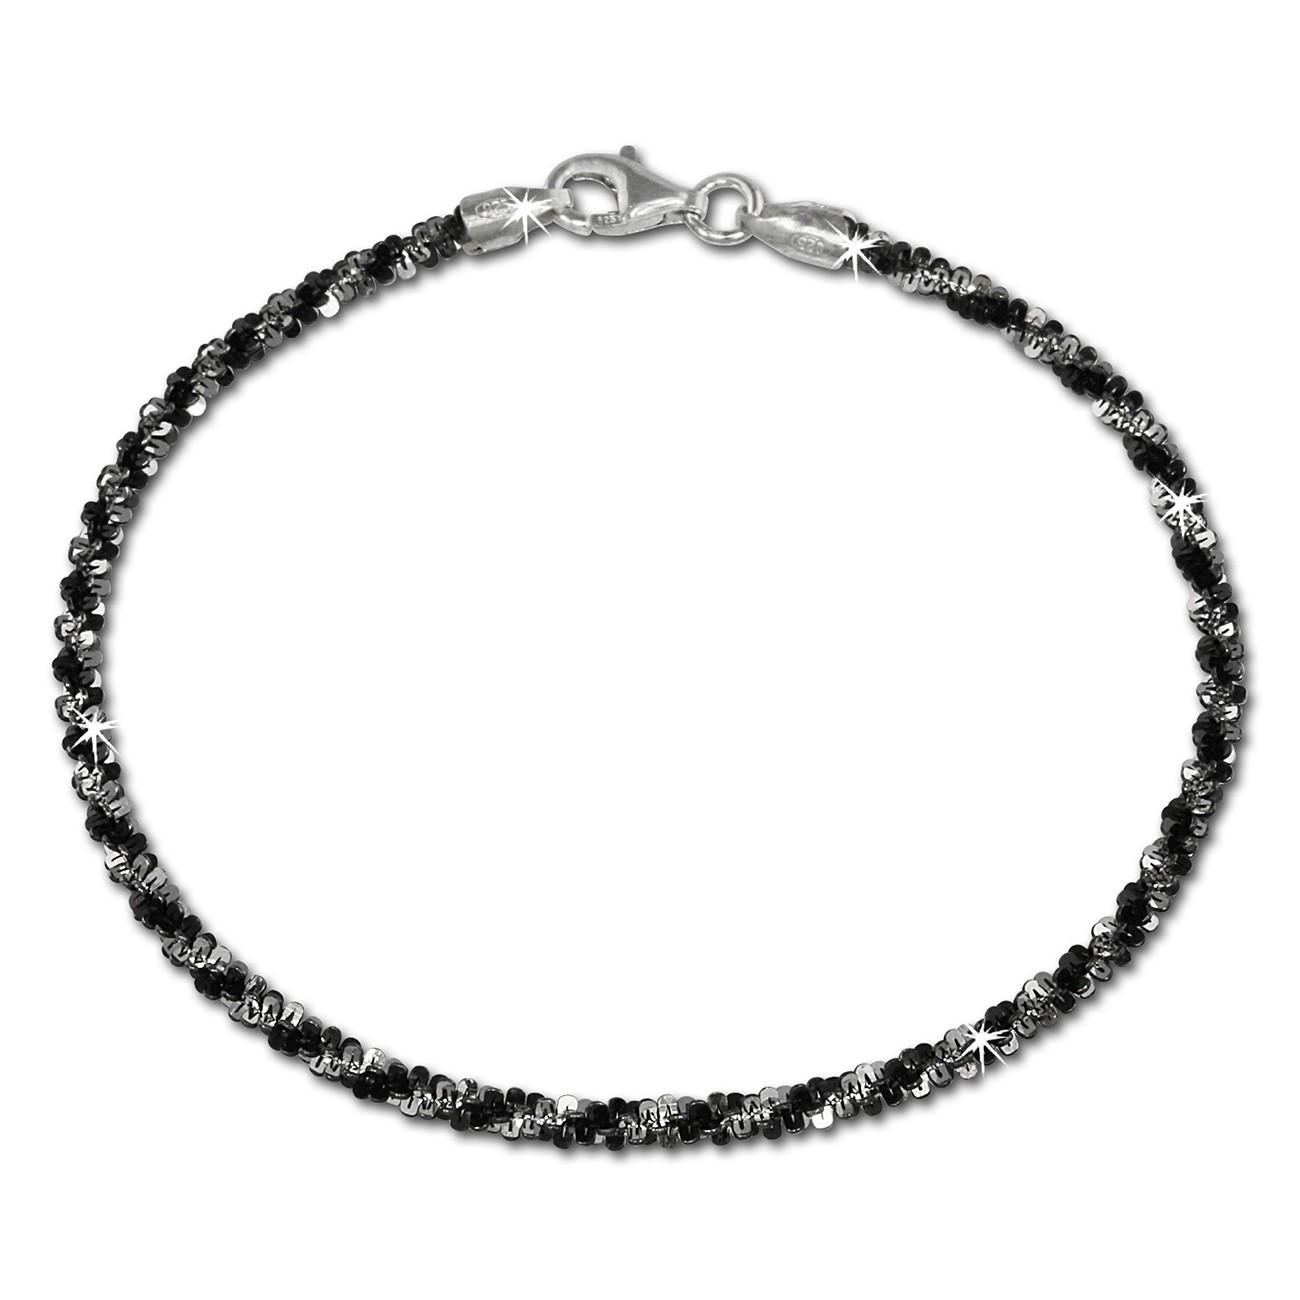 SilberDream Armband gedreht schwarz 20cm 925 Silber Damen SDA2030S